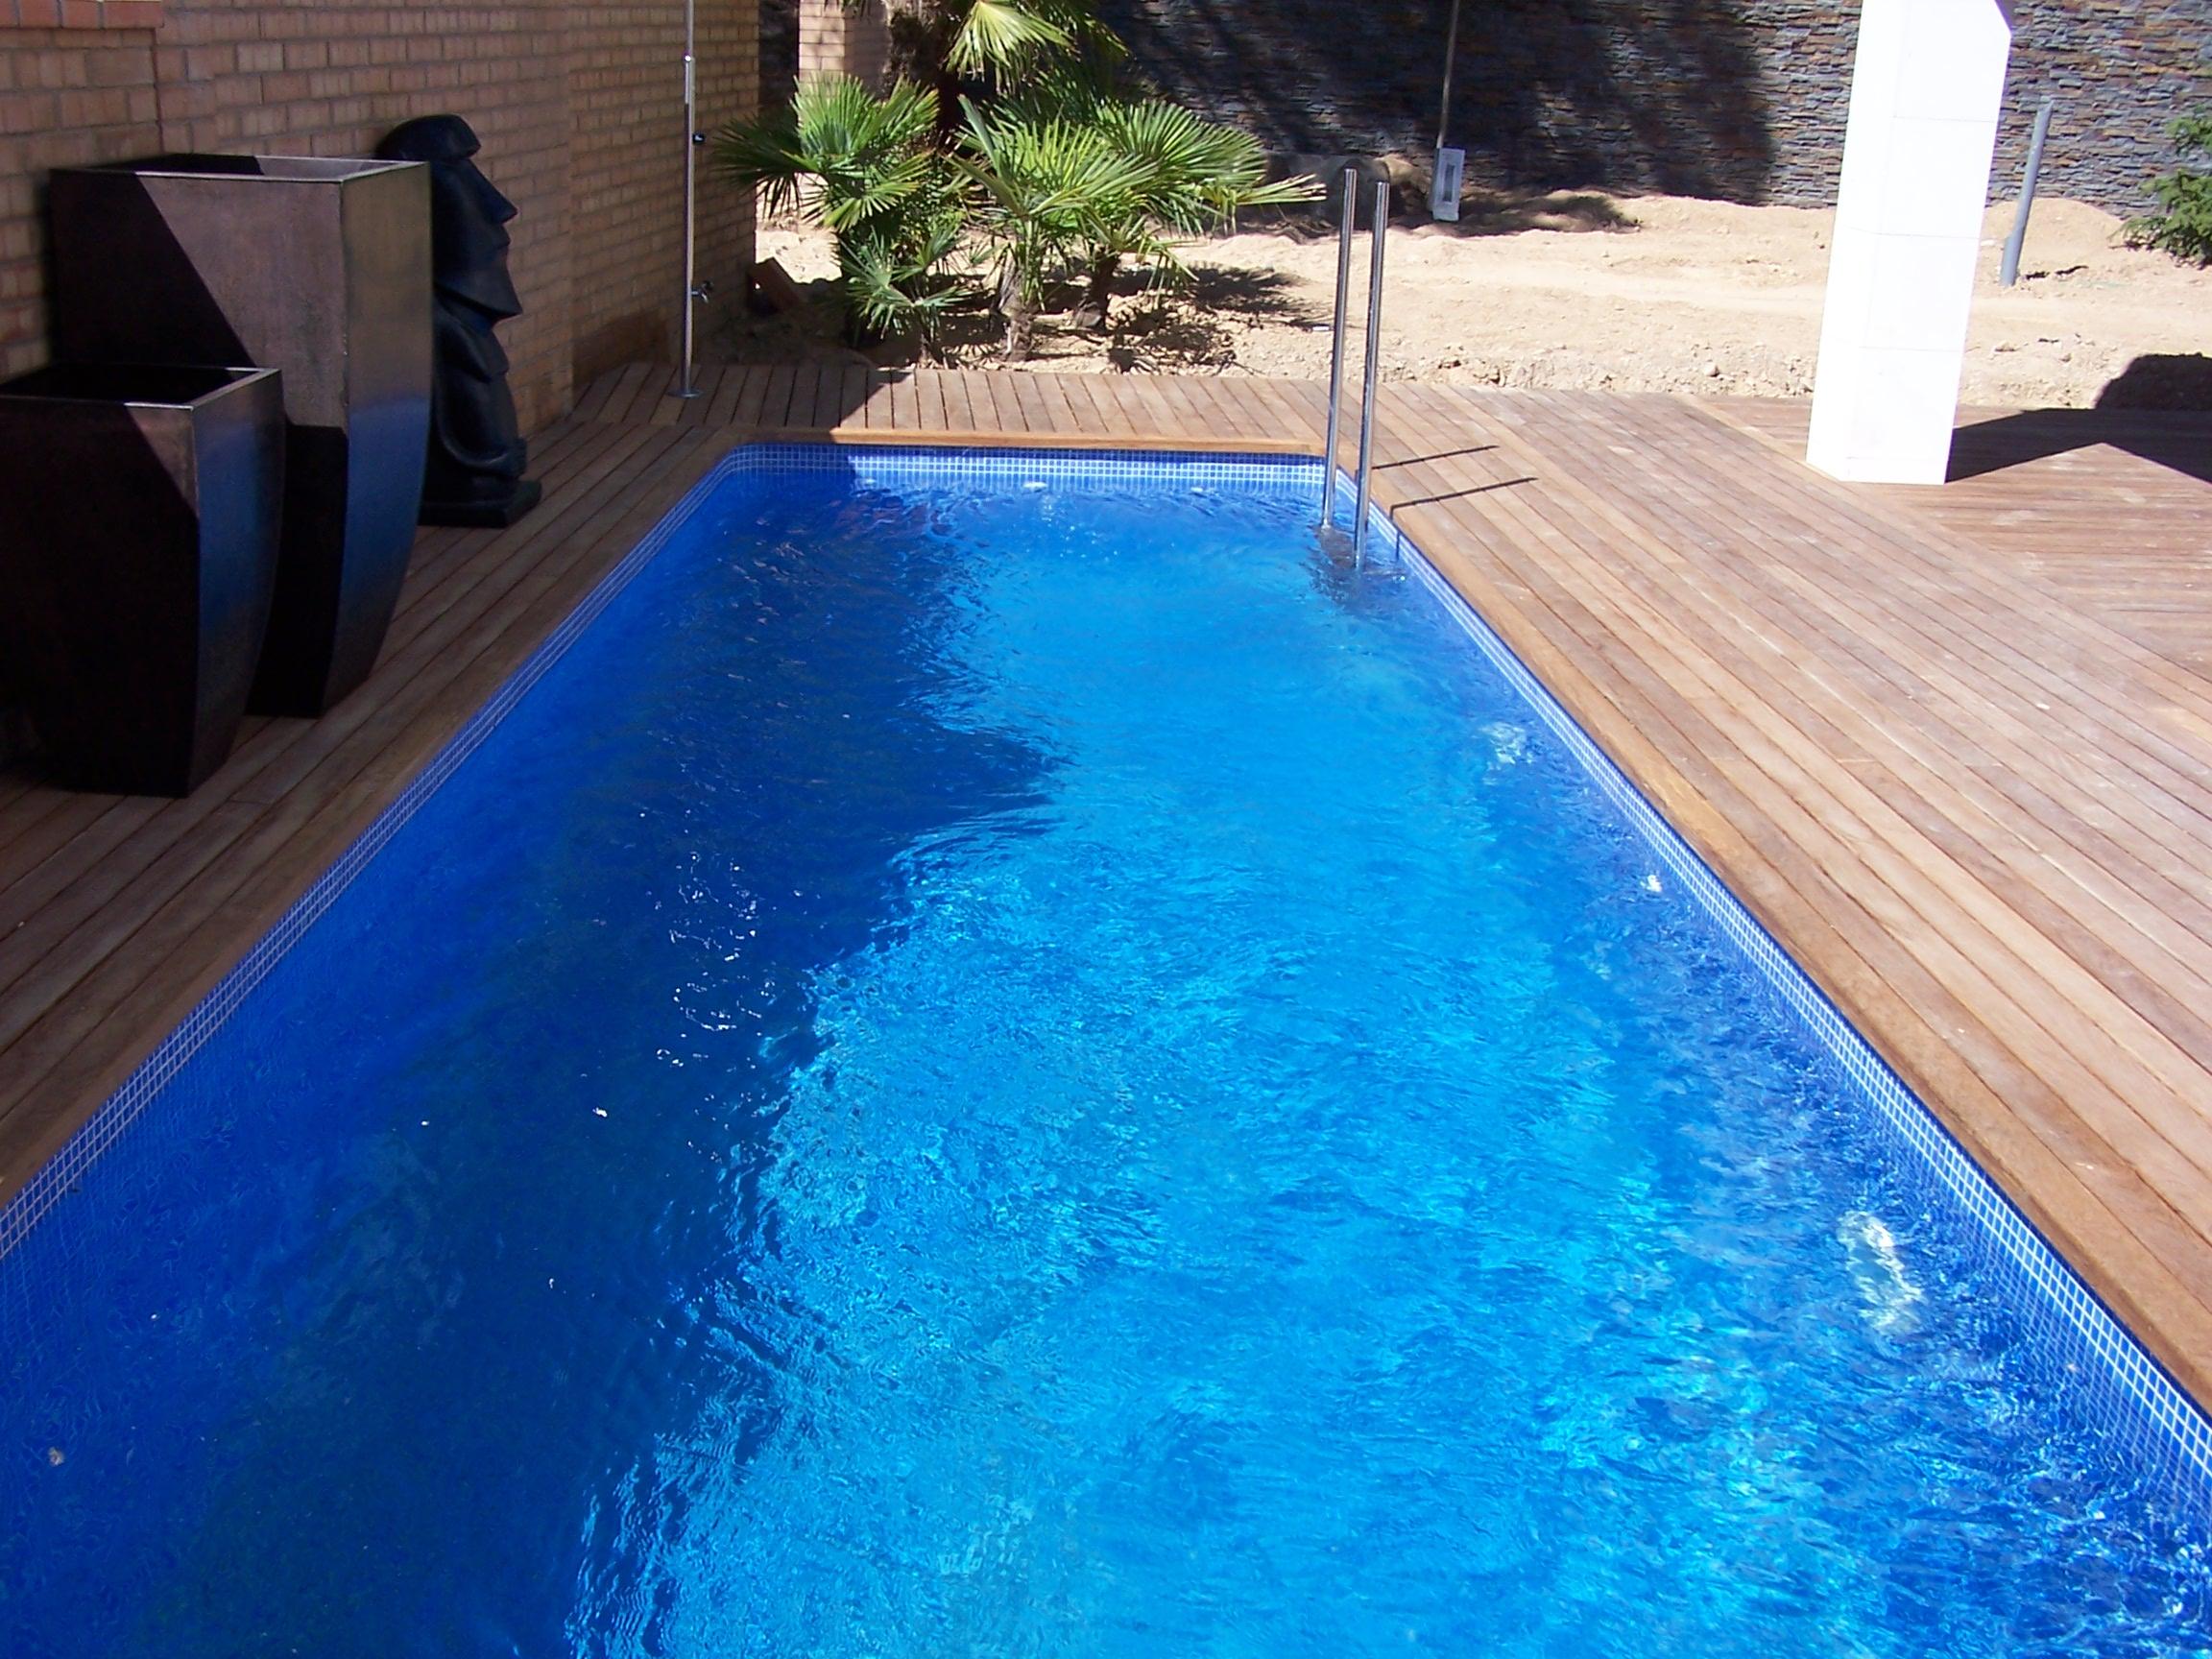 Piscinas de obra codetrac s l expertos en piscinas for Piscinas municipales hospitalet